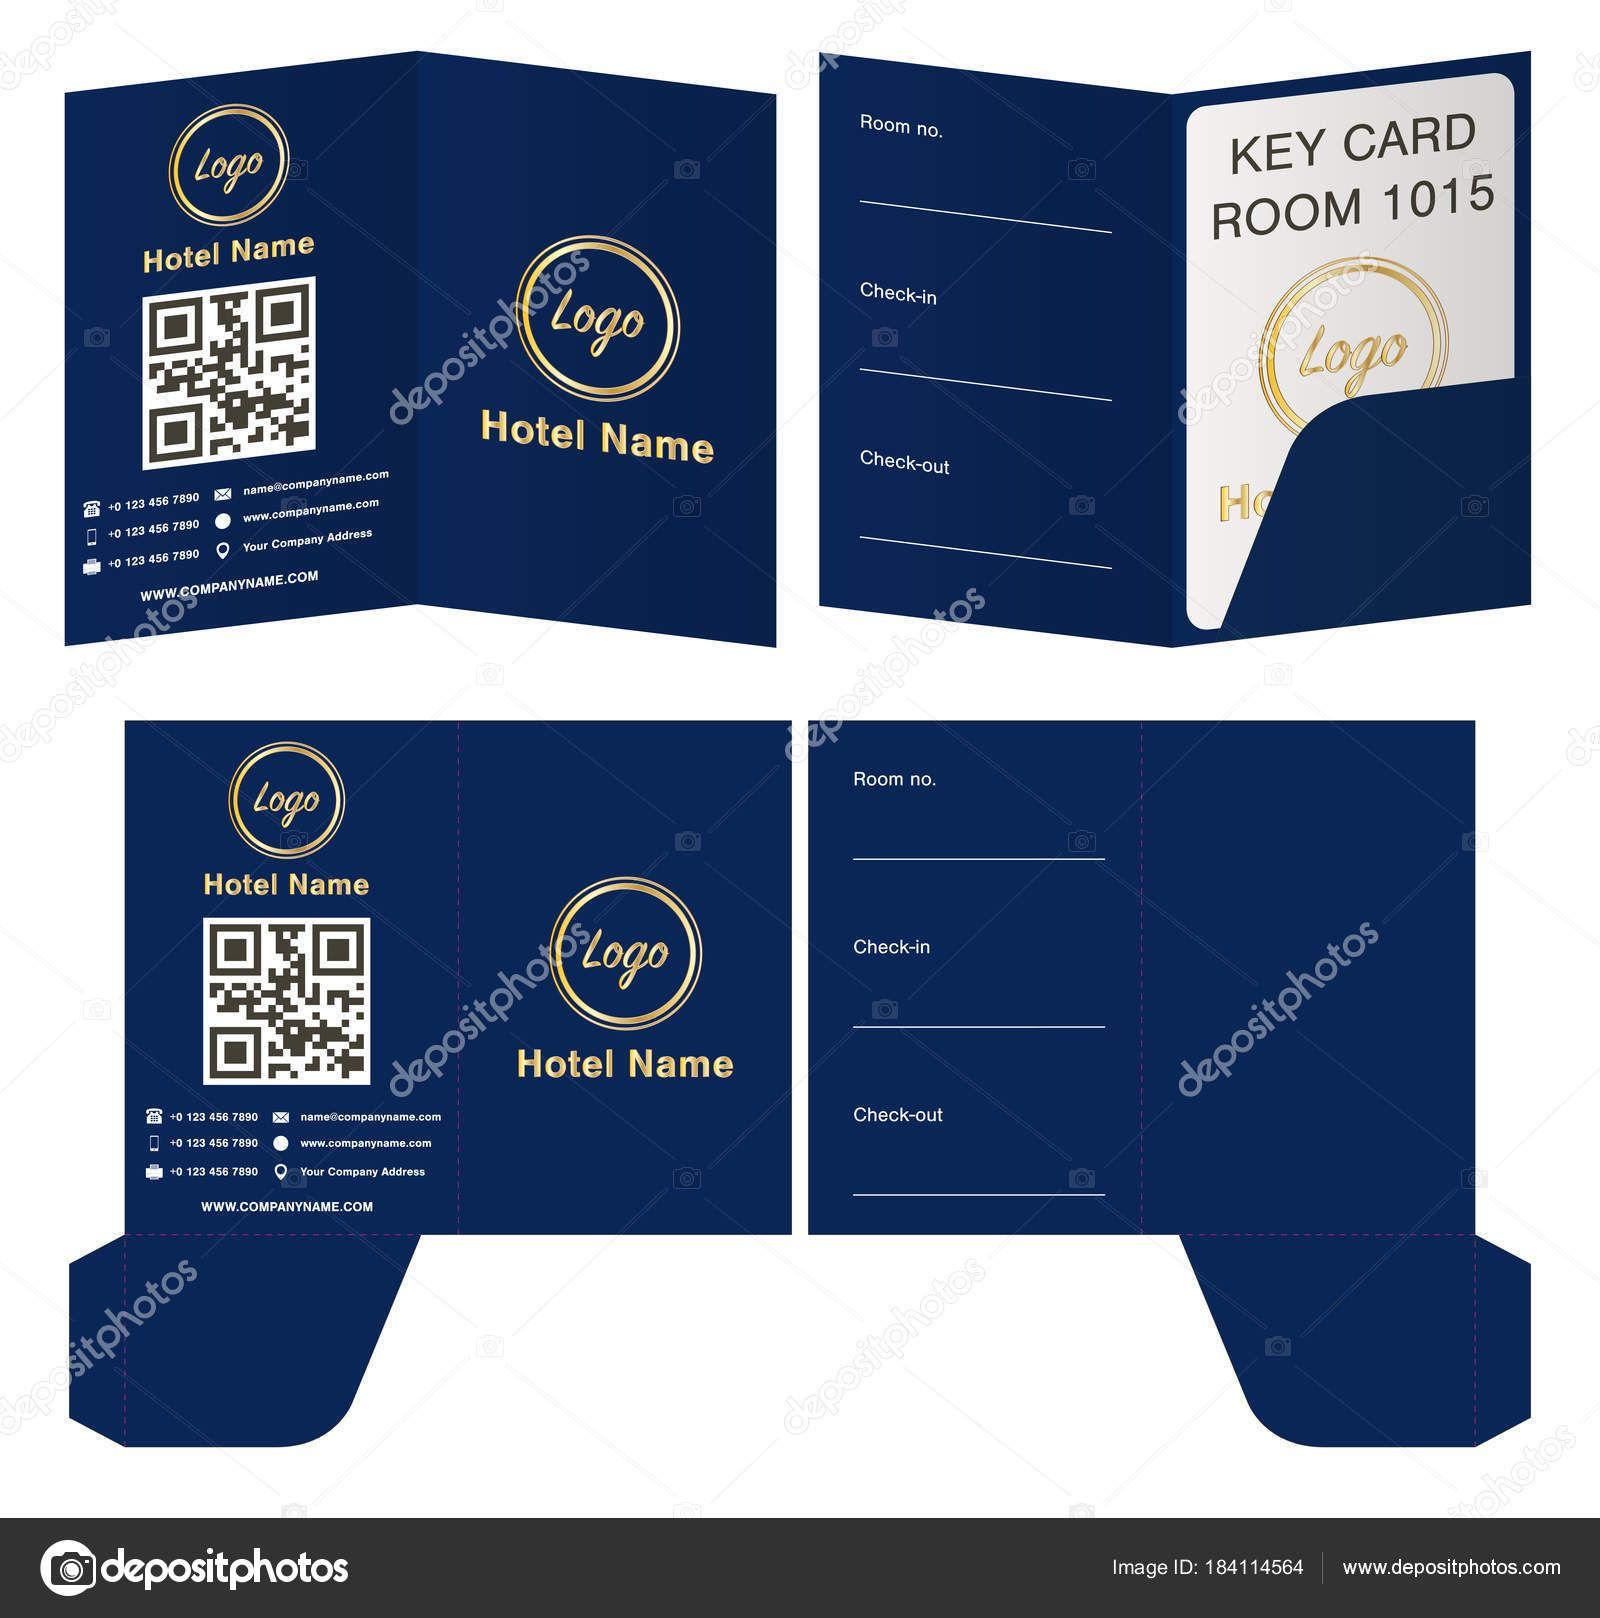 Key Card Holder Template Hotel Key Card Holder Folder With Hotel Key Card Template Profe Hotel Key Cards Create Business Cards Free Business Card Templates